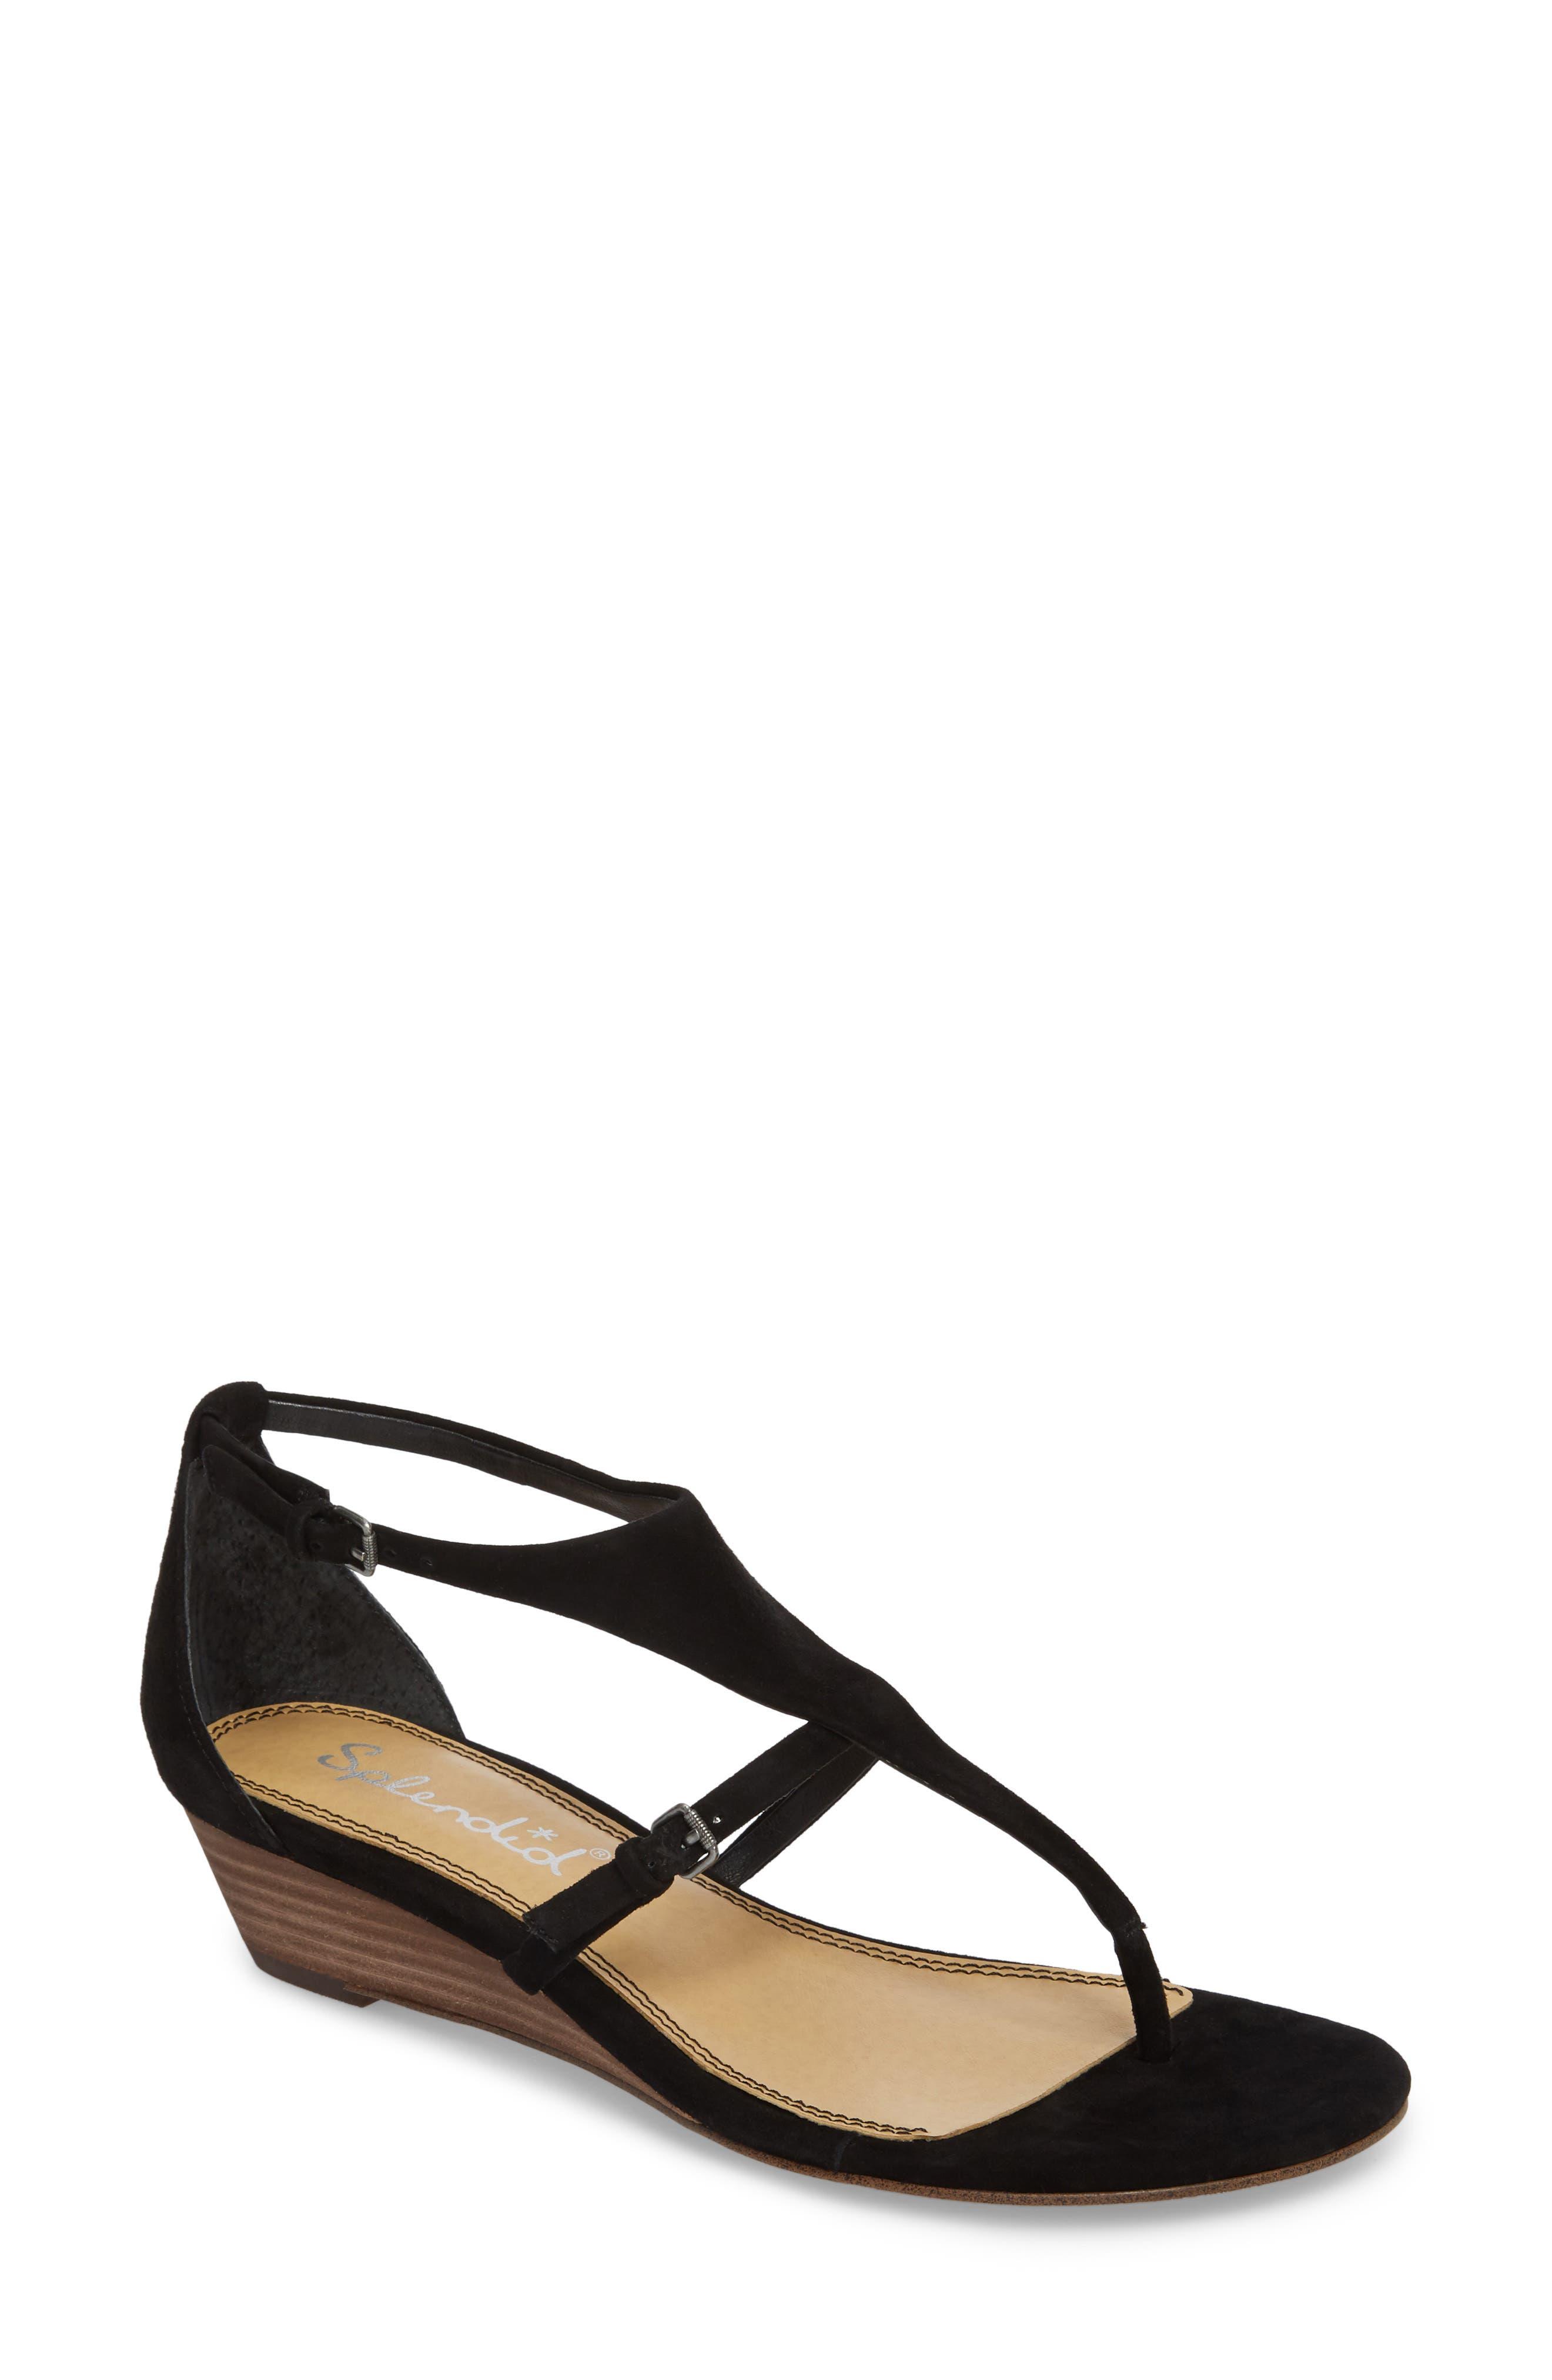 Brooklyn V-Strap Wedge Sandal,                         Main,                         color,